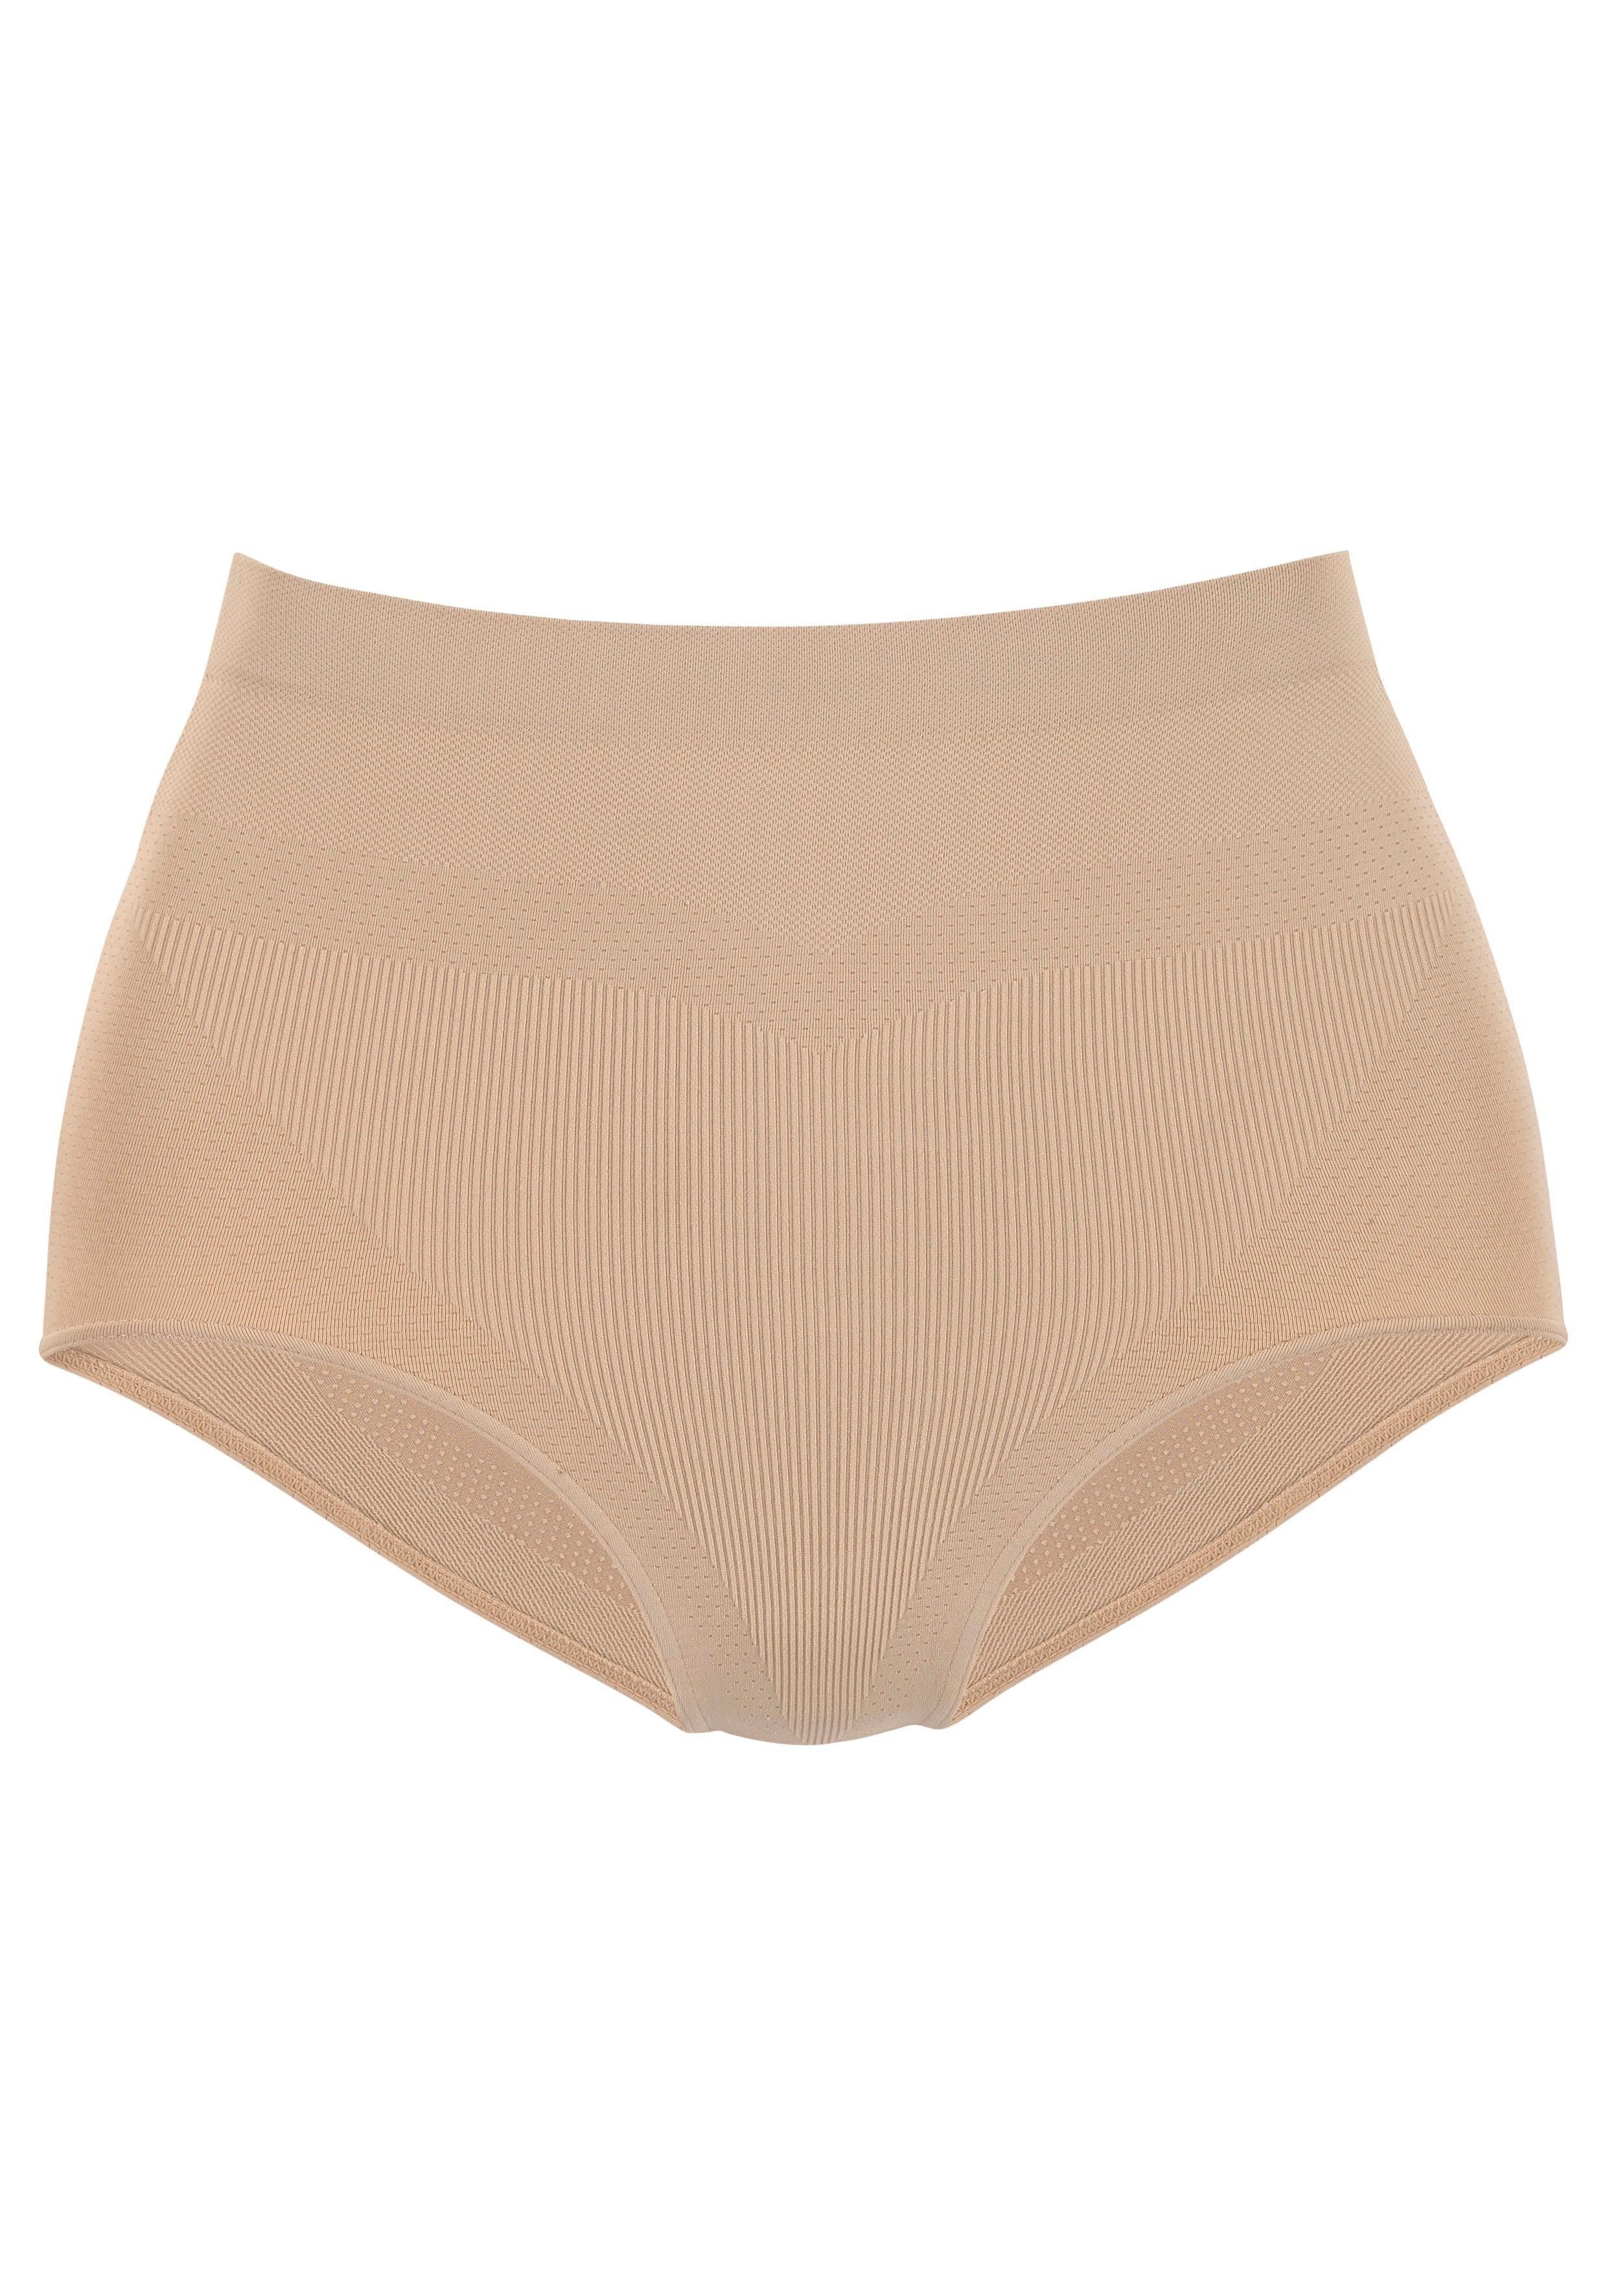 Taille slip Nuance Online shaper Comfortabele Shoppen 9eYWEbH2ID